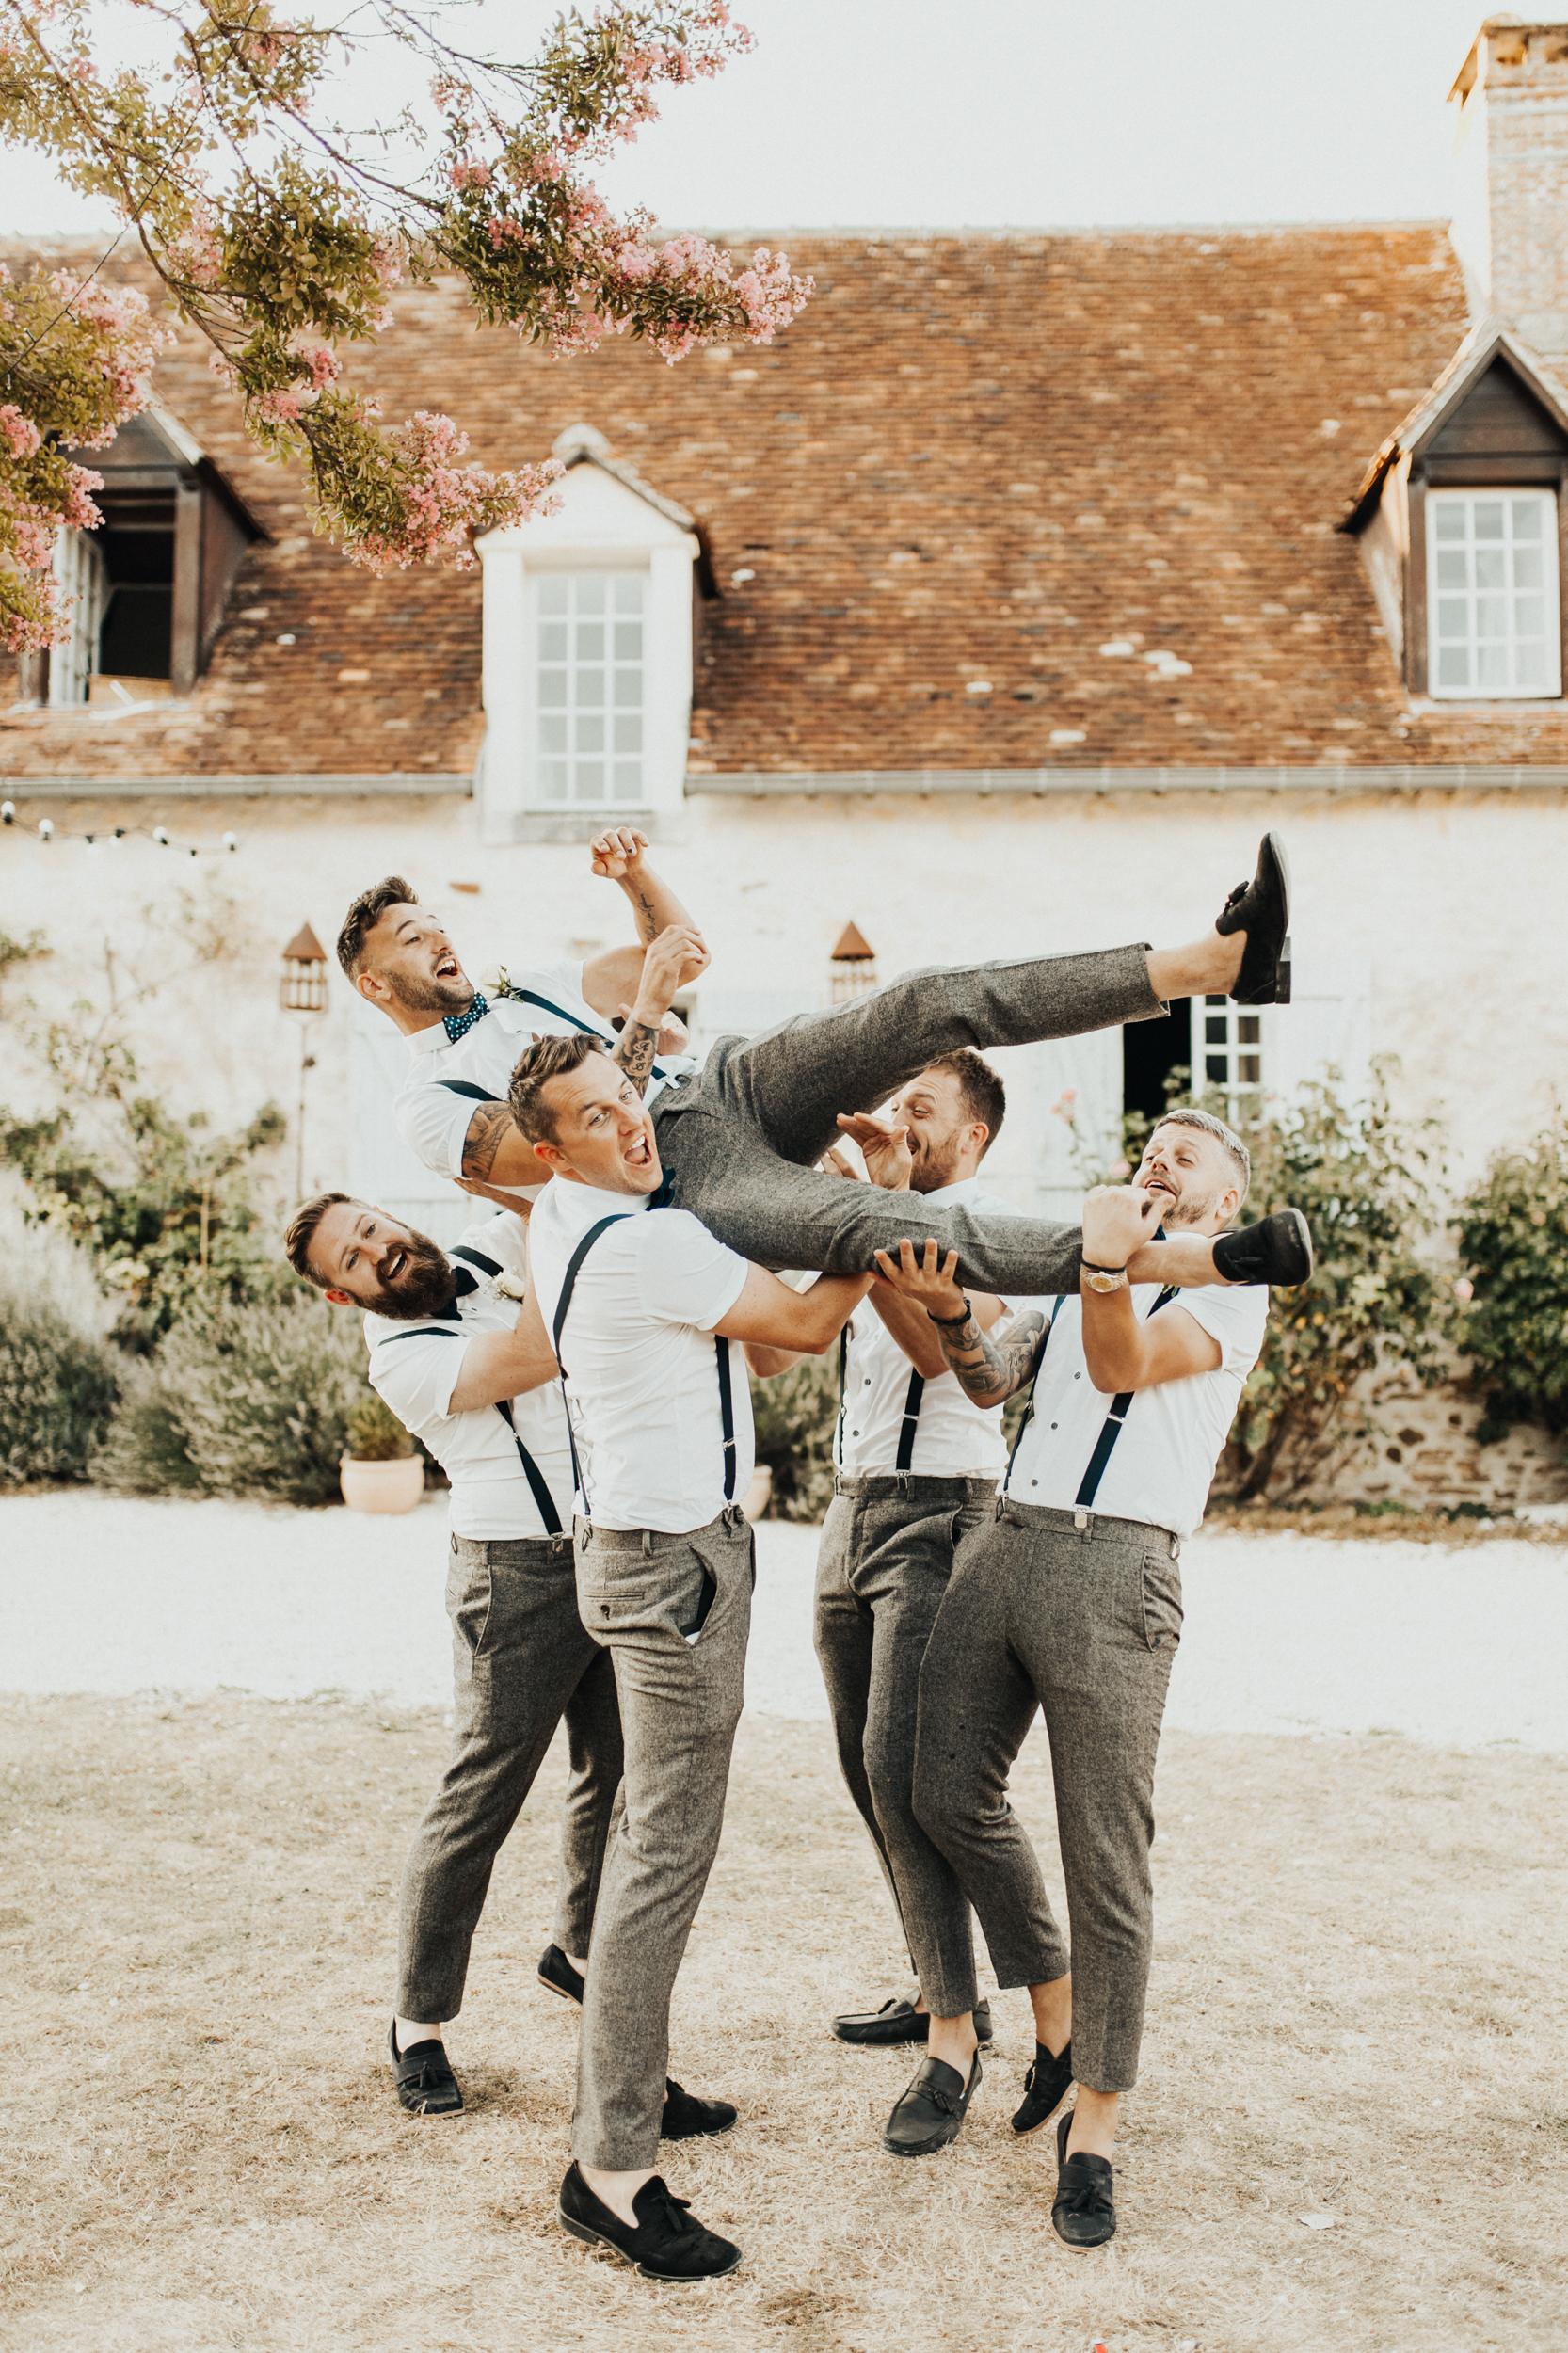 Amy-Zac-Destination-Wedding-France-Manoir-Foulquetiere-Darina-Stoda-Photography-78.jpg